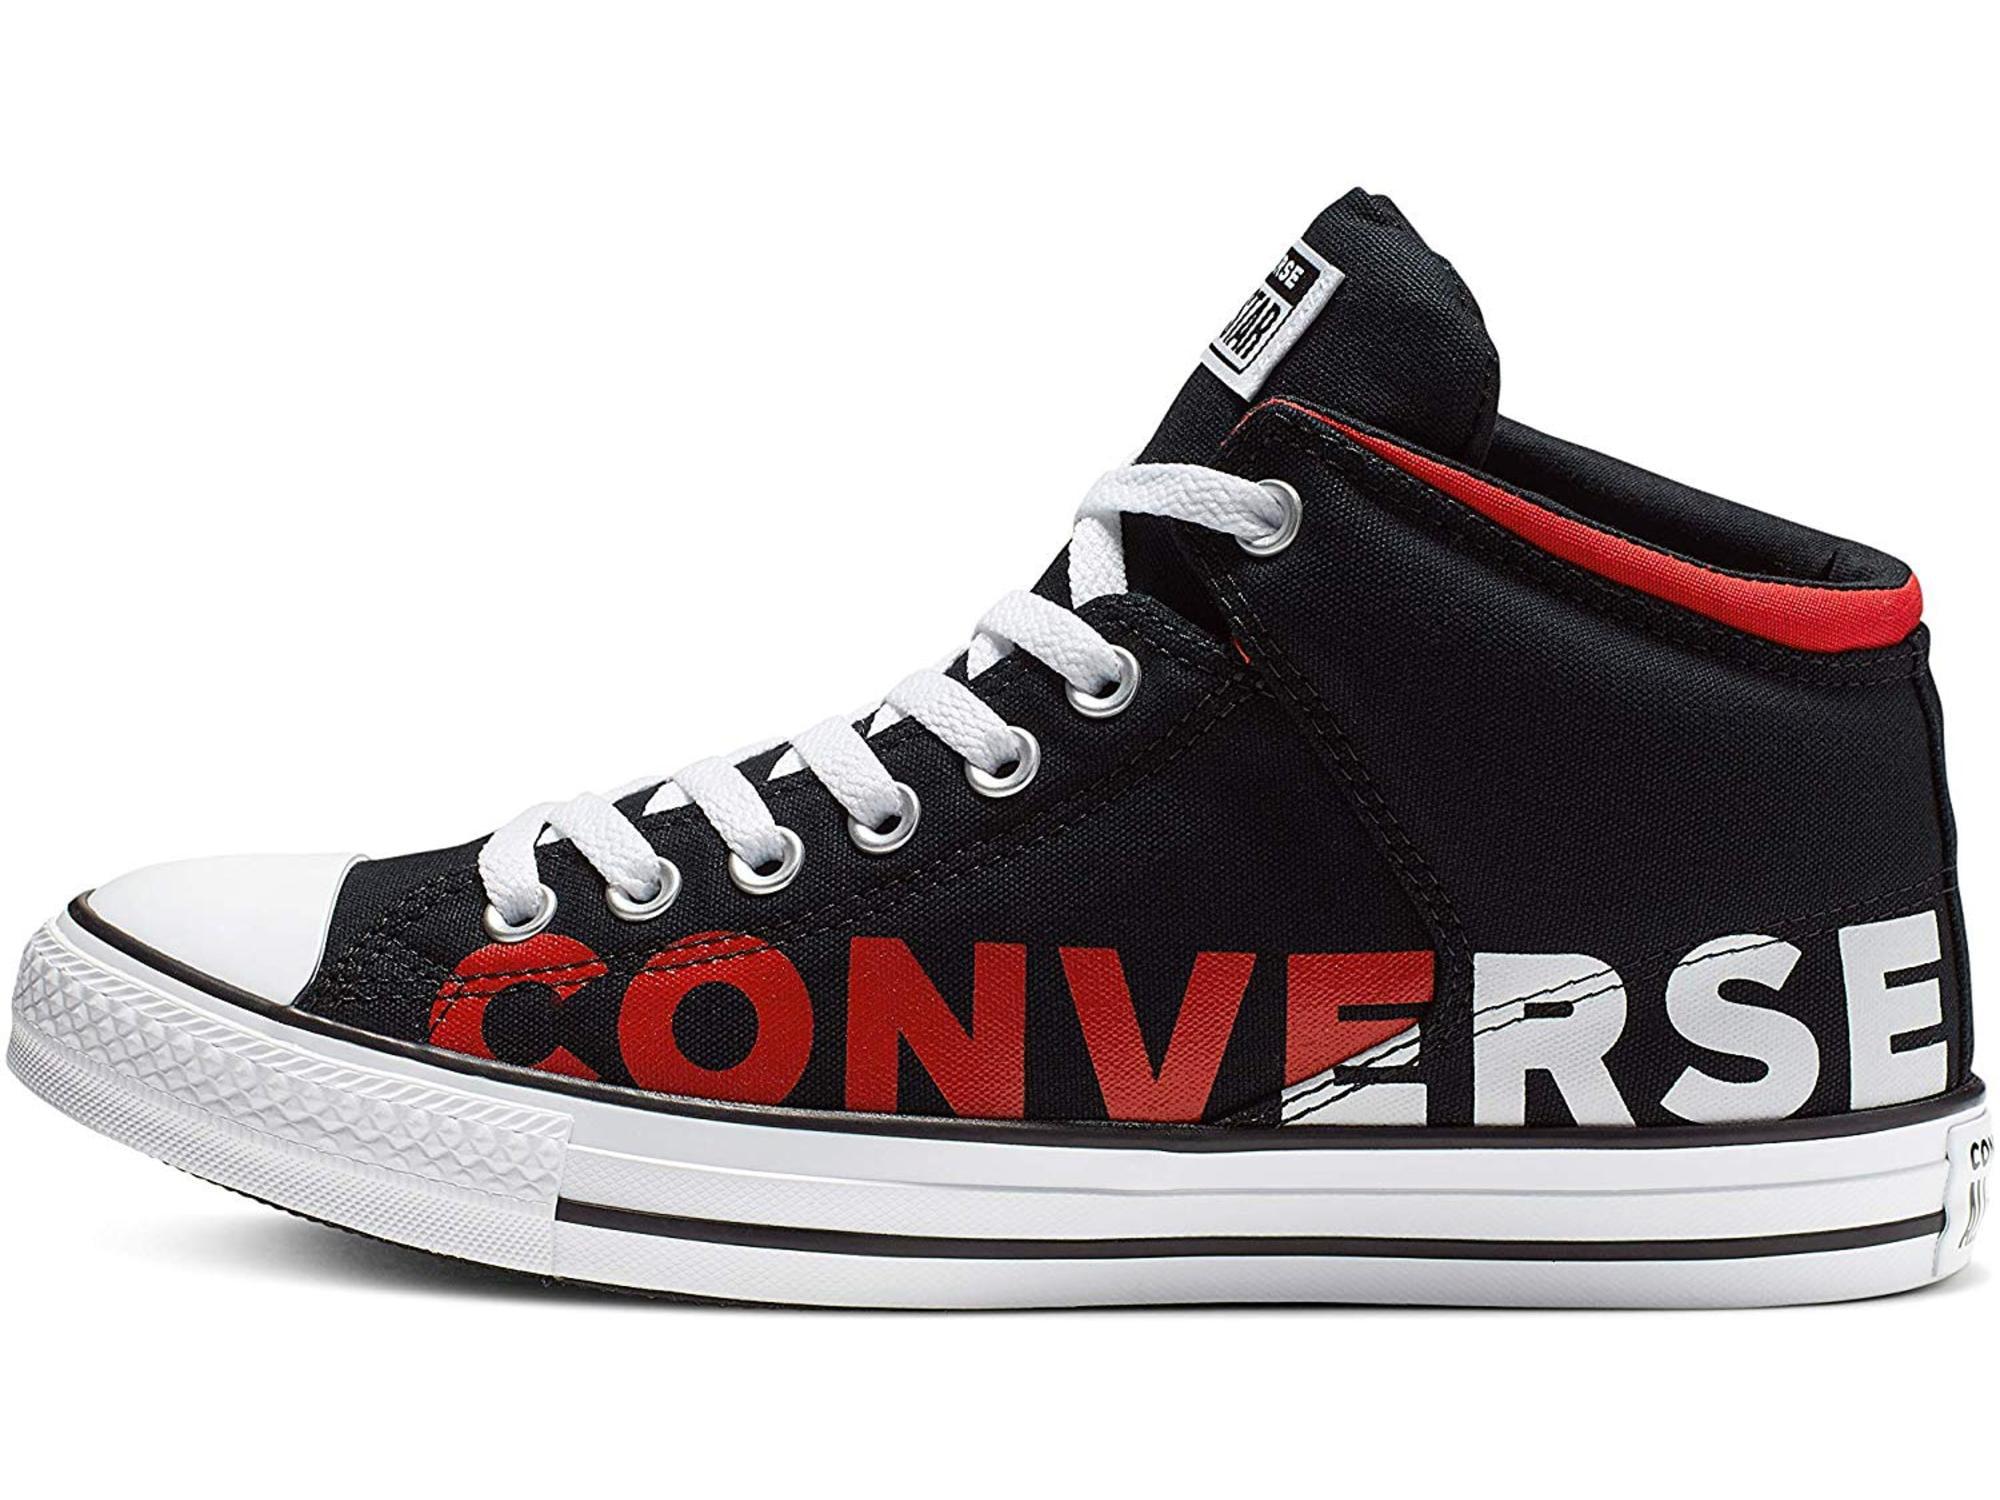 Descripción Indígena Erudito  Converse - Converse Men's Chuck Taylor All Star High Street Wordmark 2.0  Sneaker - Walmart.com - Walmart.com